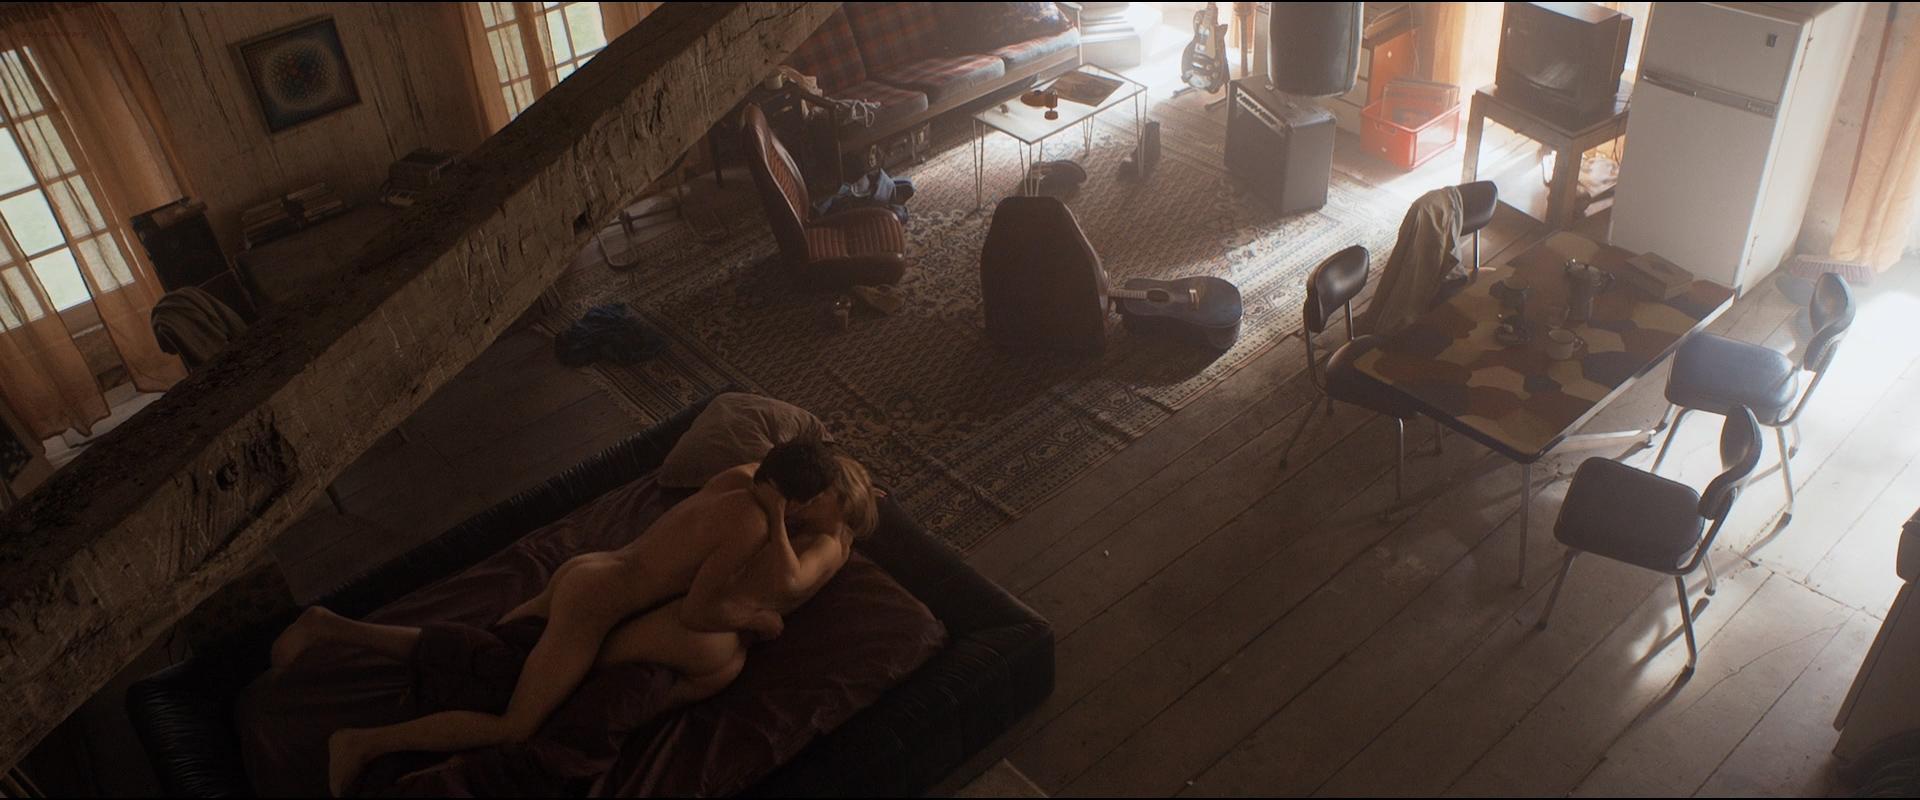 Loes Haverkort nude hot sex - Rendez-Vous (NL-2015) HD 1080p BluRay (14)